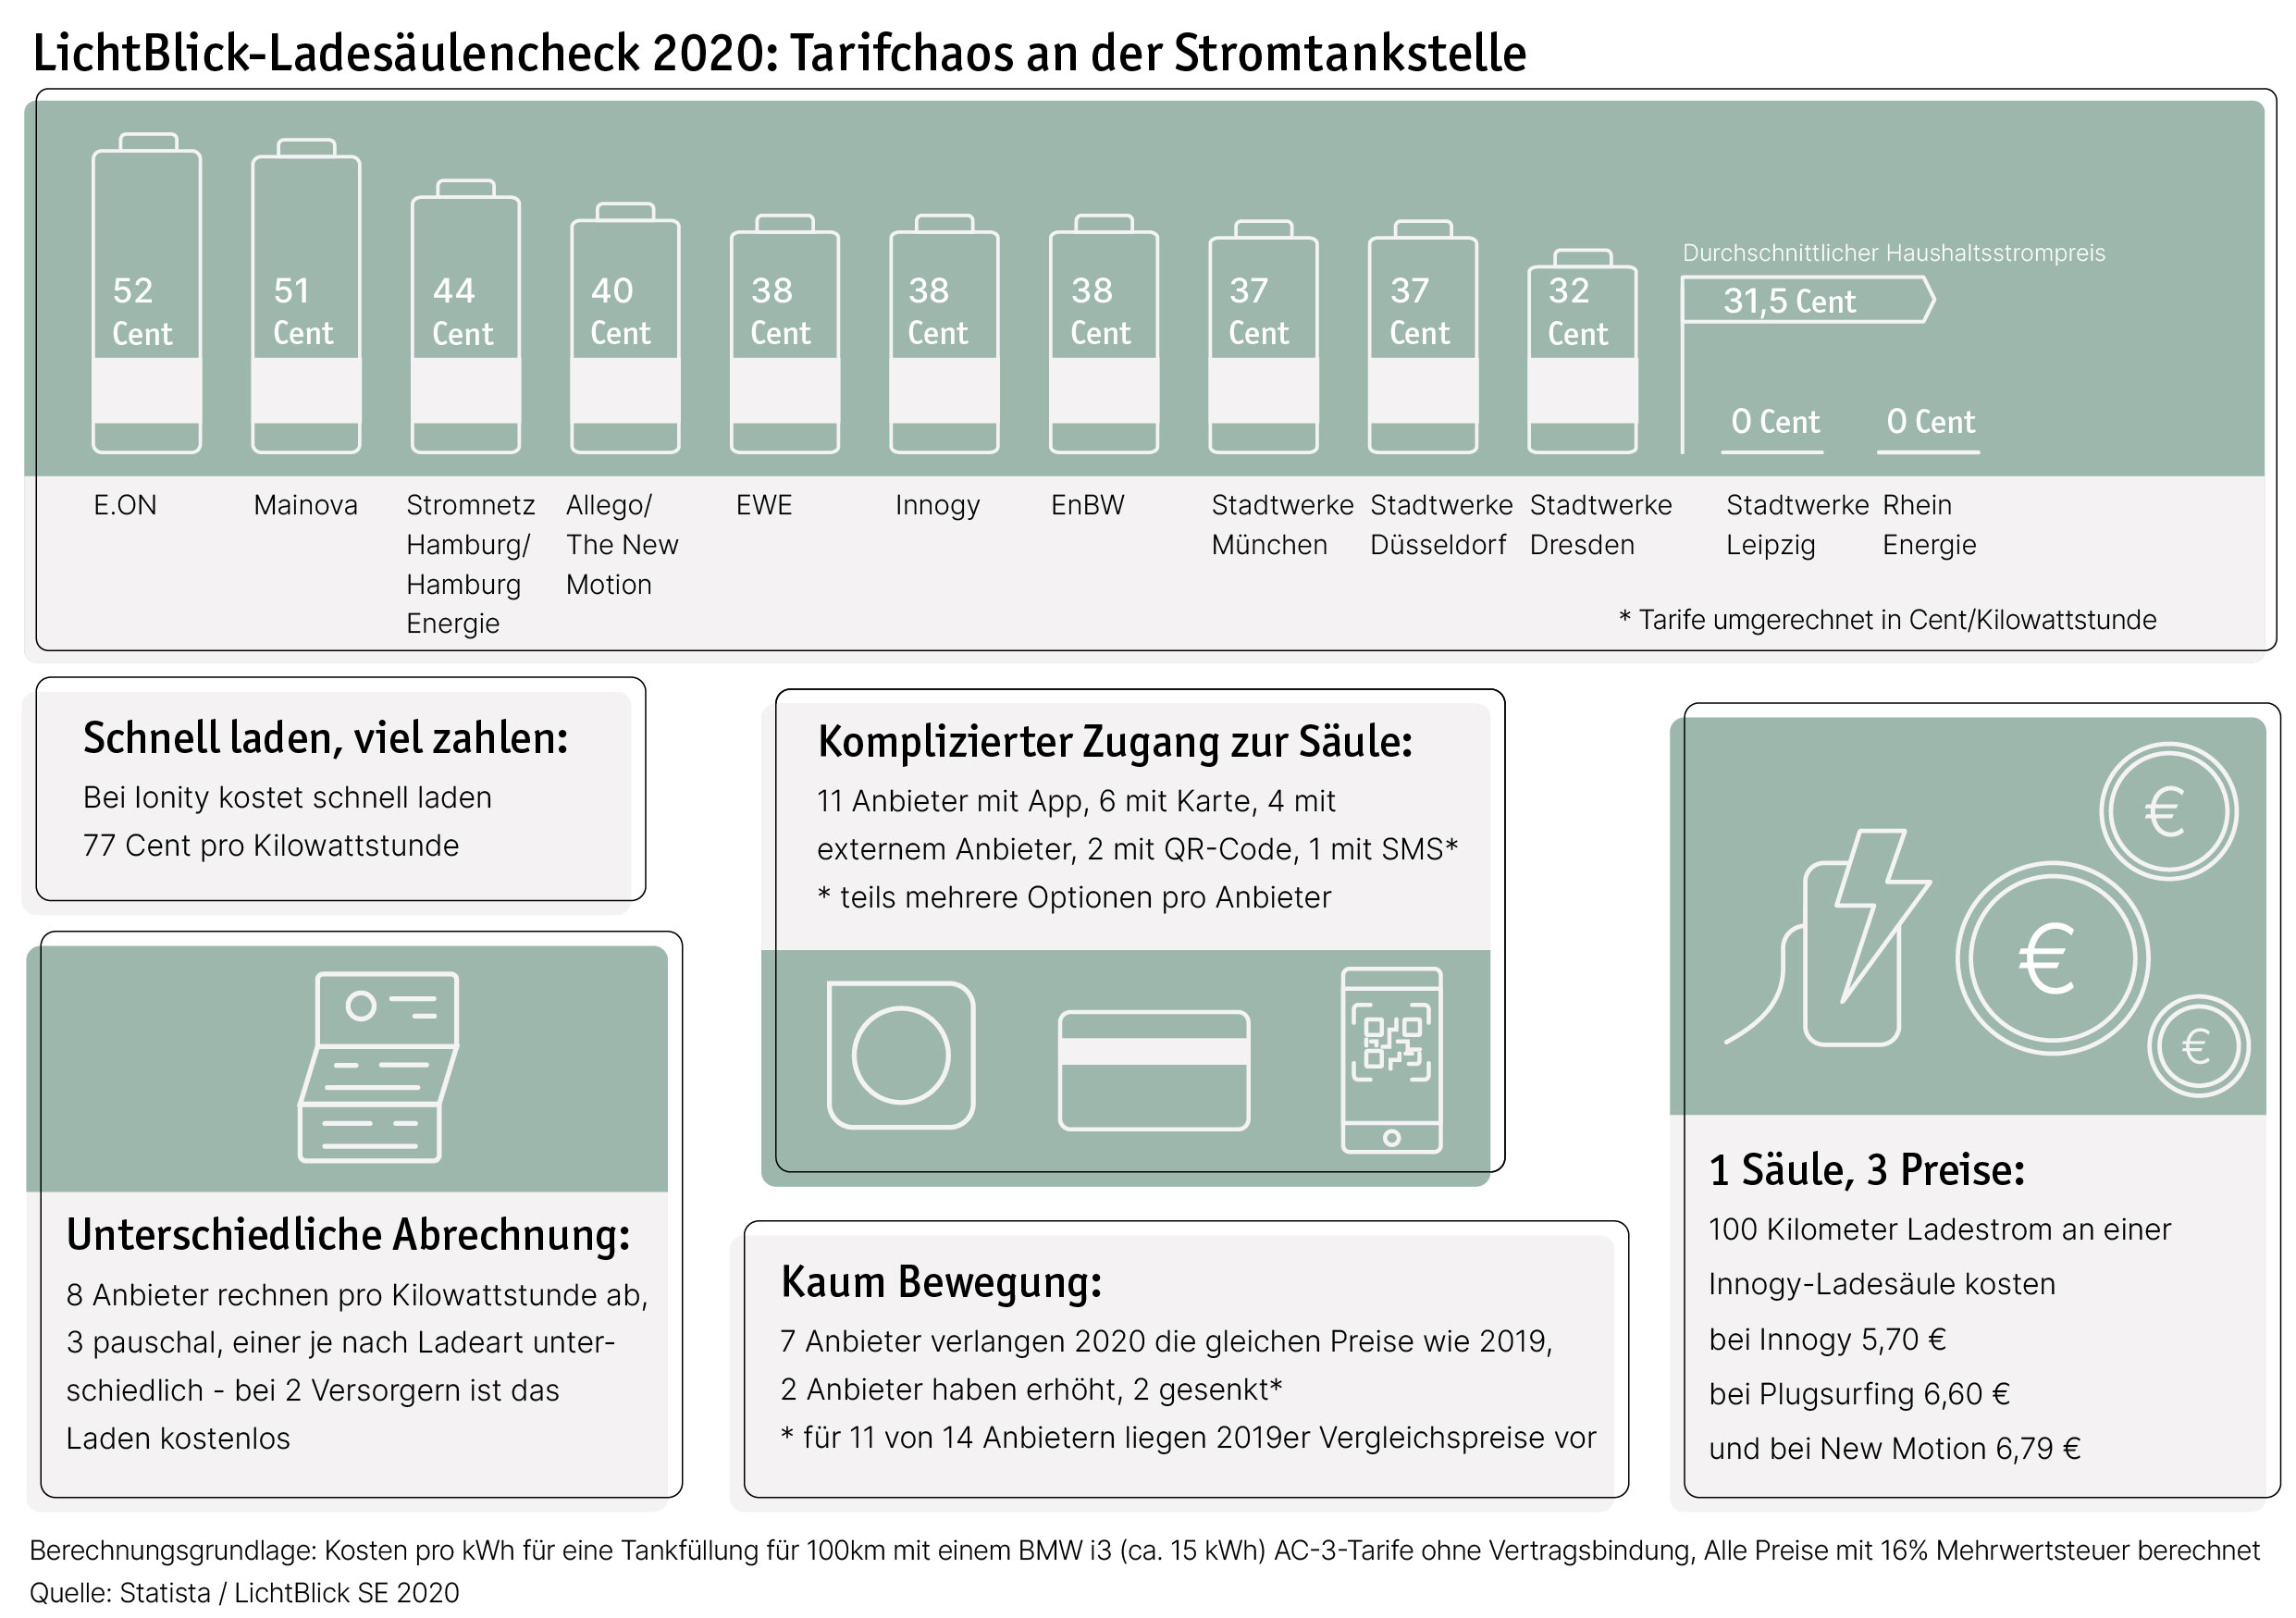 LichtBlick_Ladesaeulencheck-2020